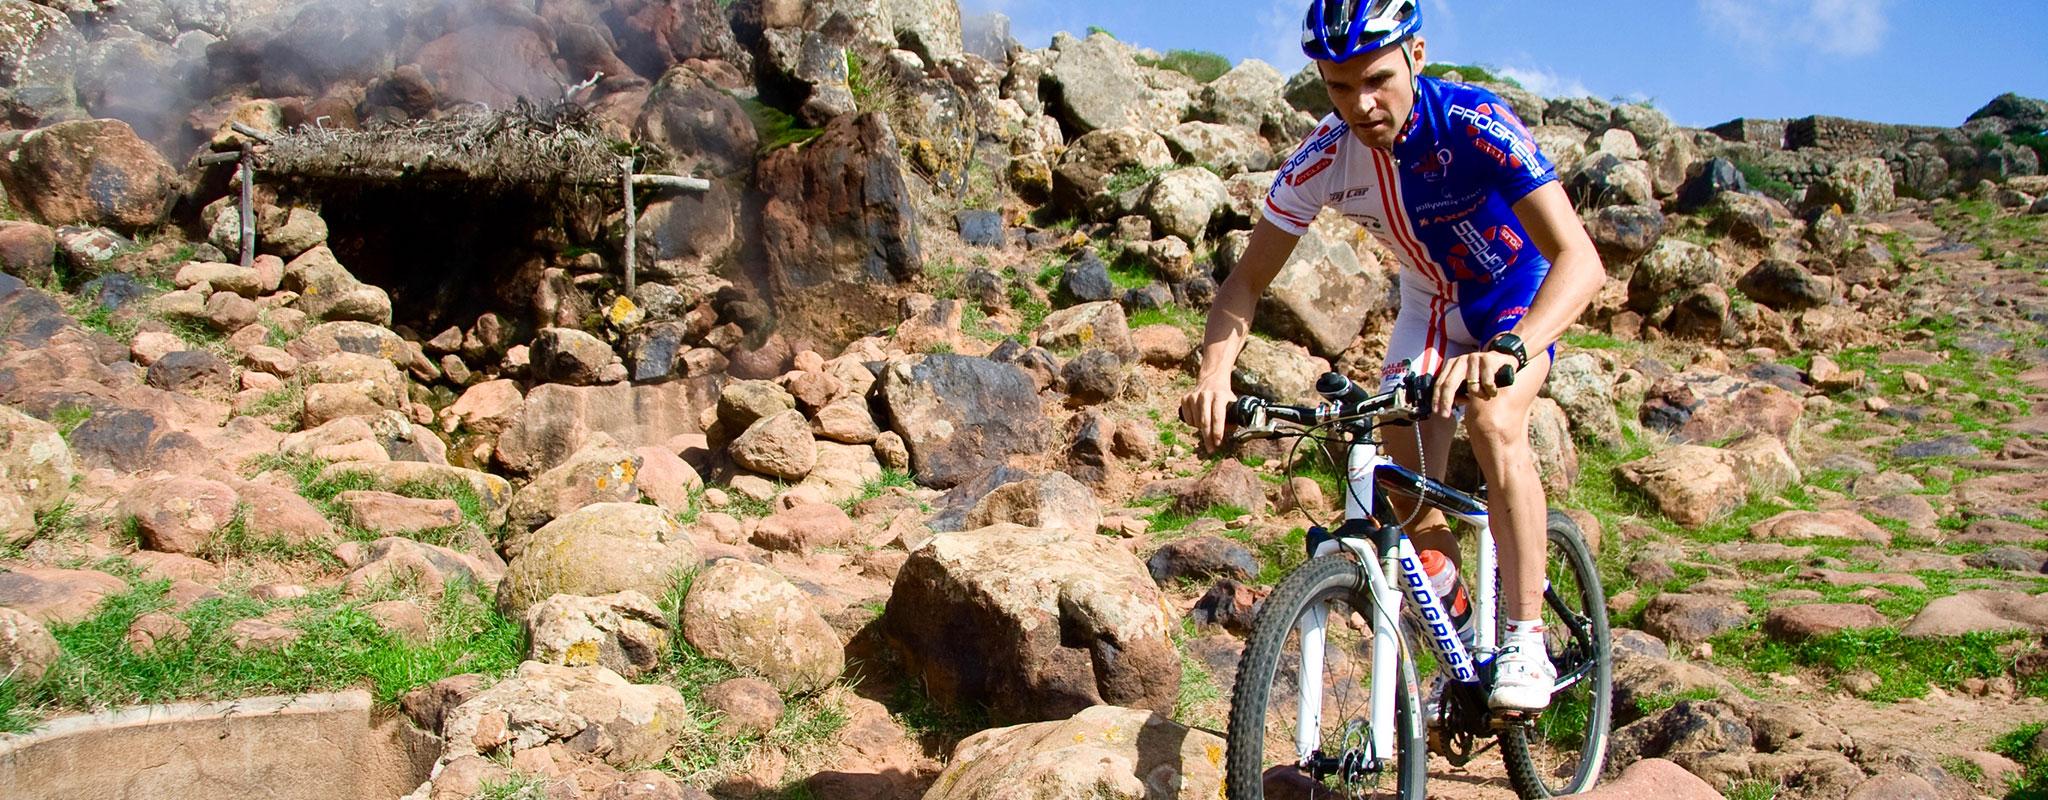 bike in montagna pantelleria